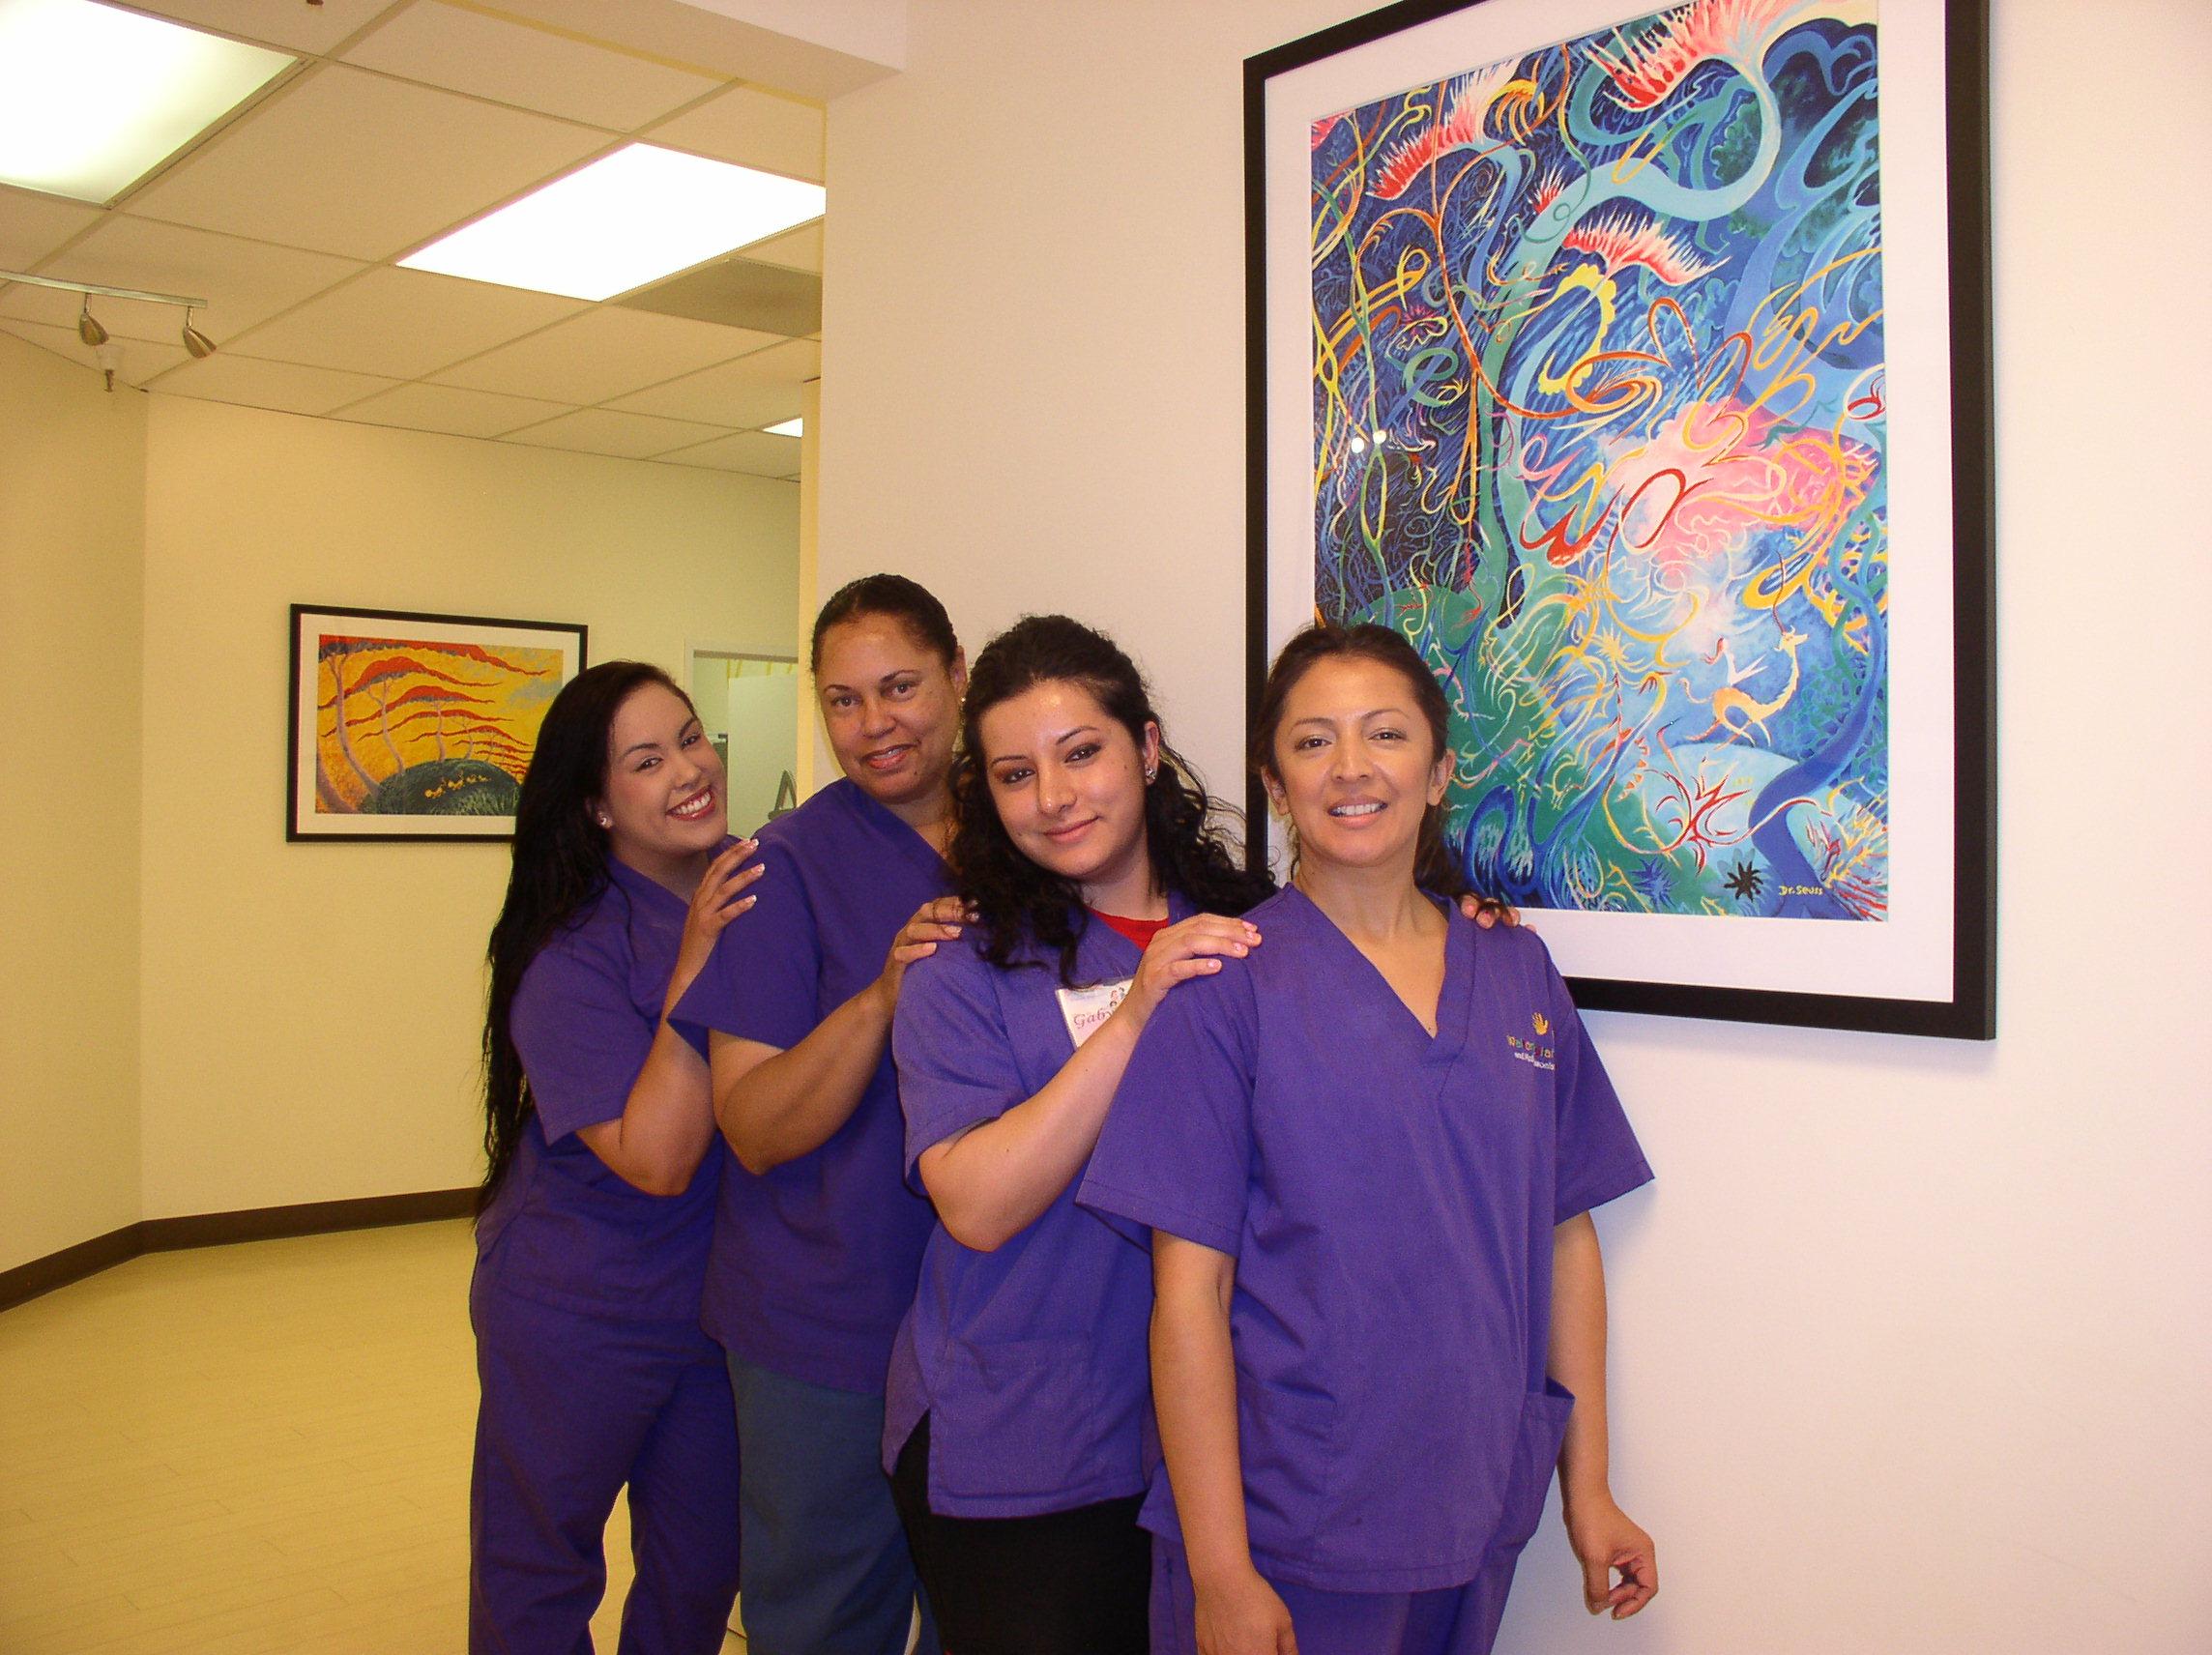 Walton Pediatrics Dr. Suess Gallery!